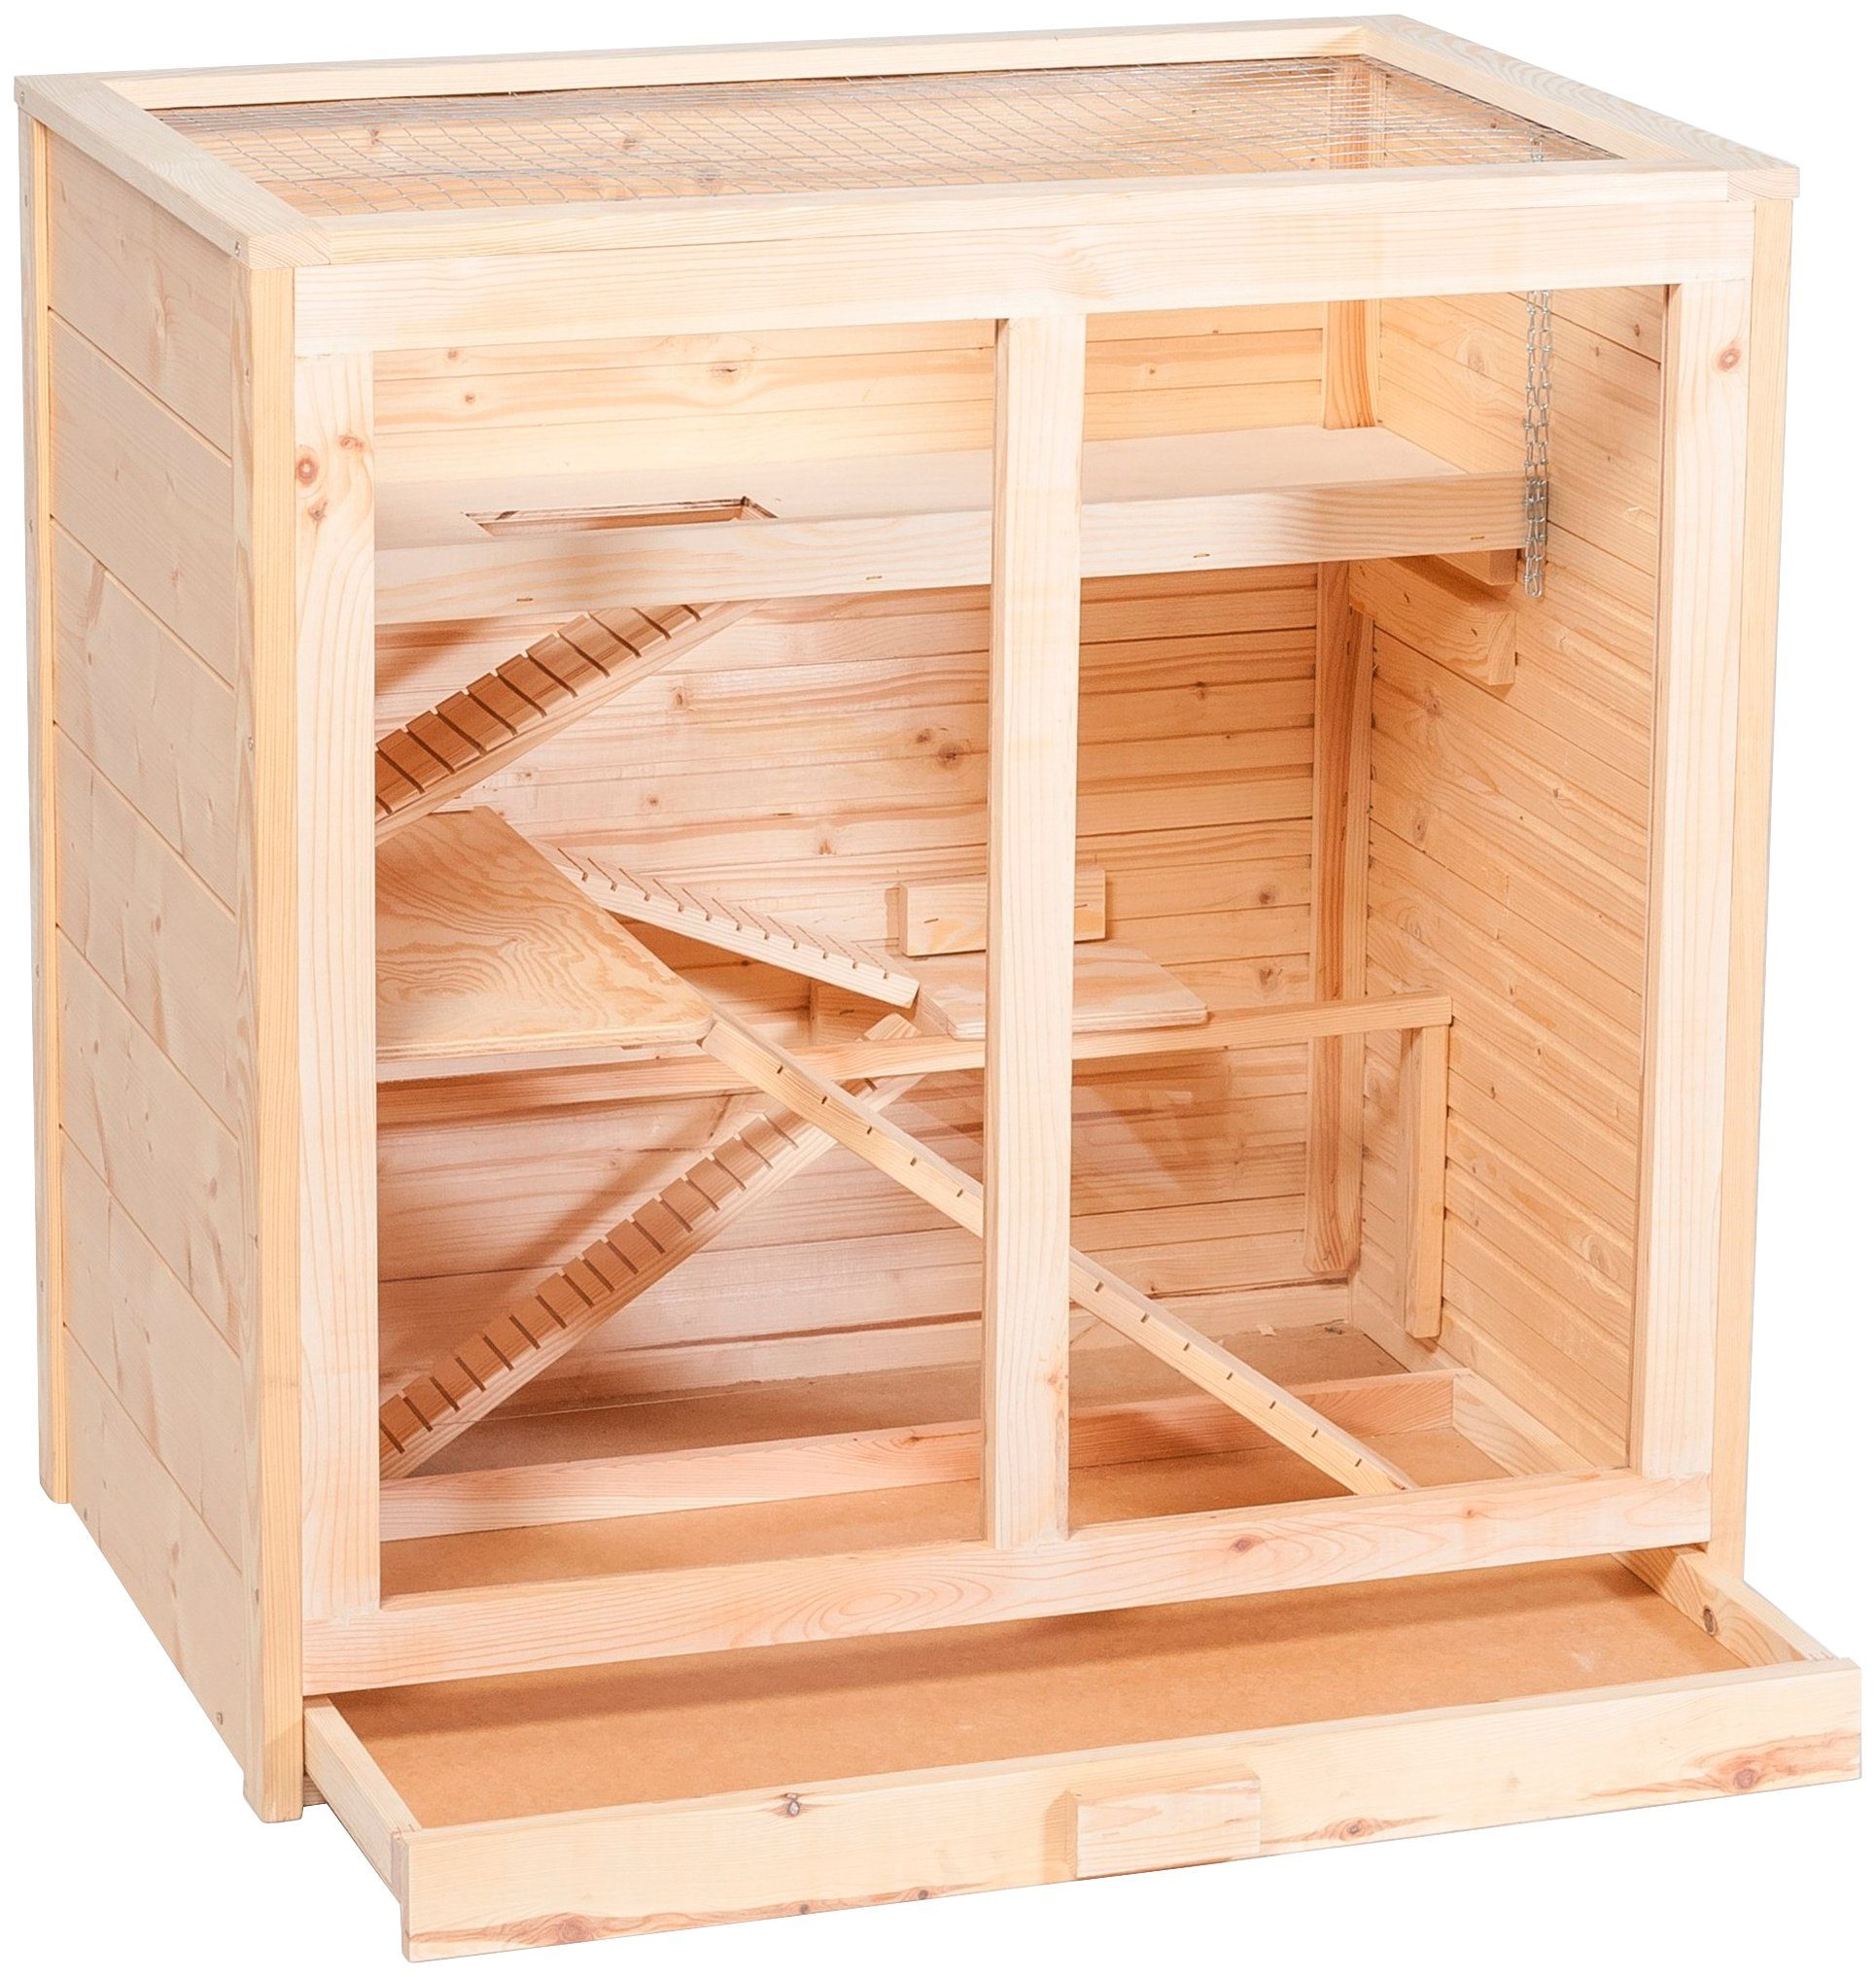 SILVIO DESIGN Hamsterkäfig »Arni«, B/T/H: 80/53/80 cm